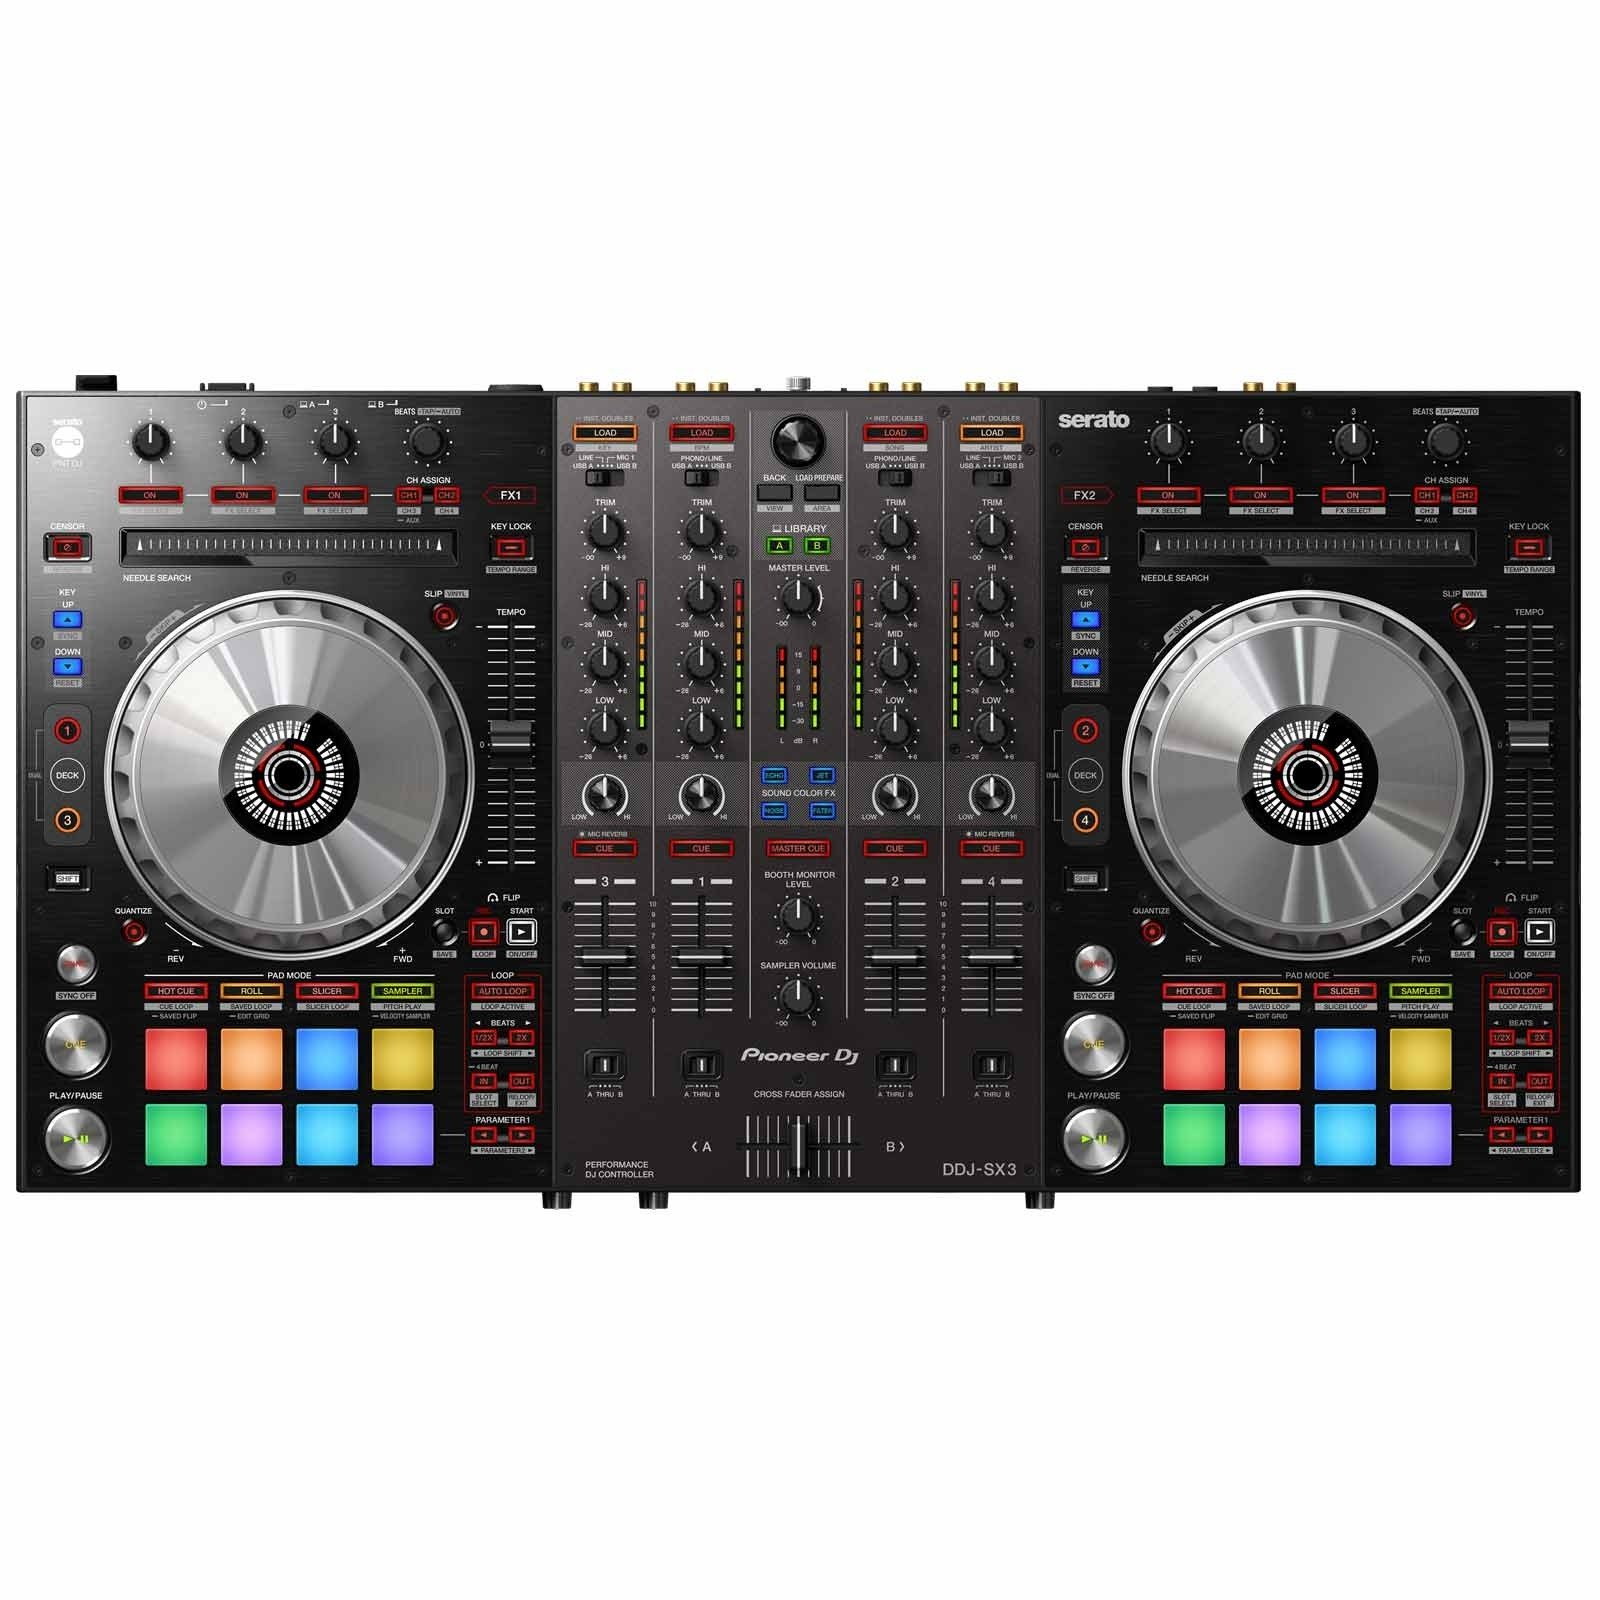 Pioneer DJ DDJ-SX3 Controller for Serato DJ Pro